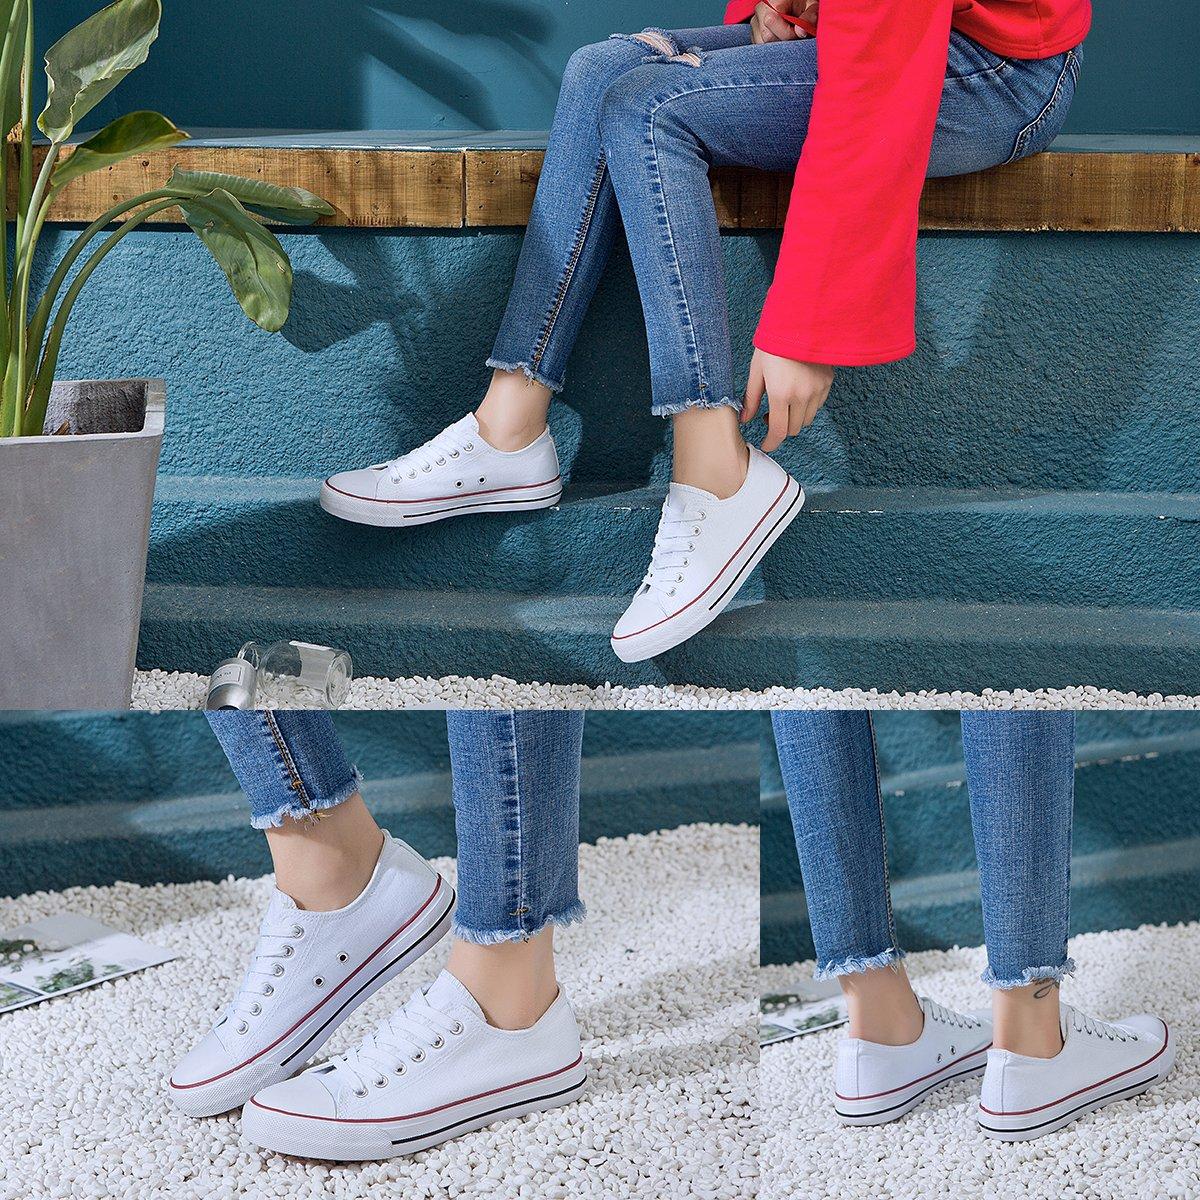 AOMAIS Womens Canvas Shoes Sneaker Low Top Lace up Fashion Walking Shoes (US7, white1) … by AOMAIS (Image #5)